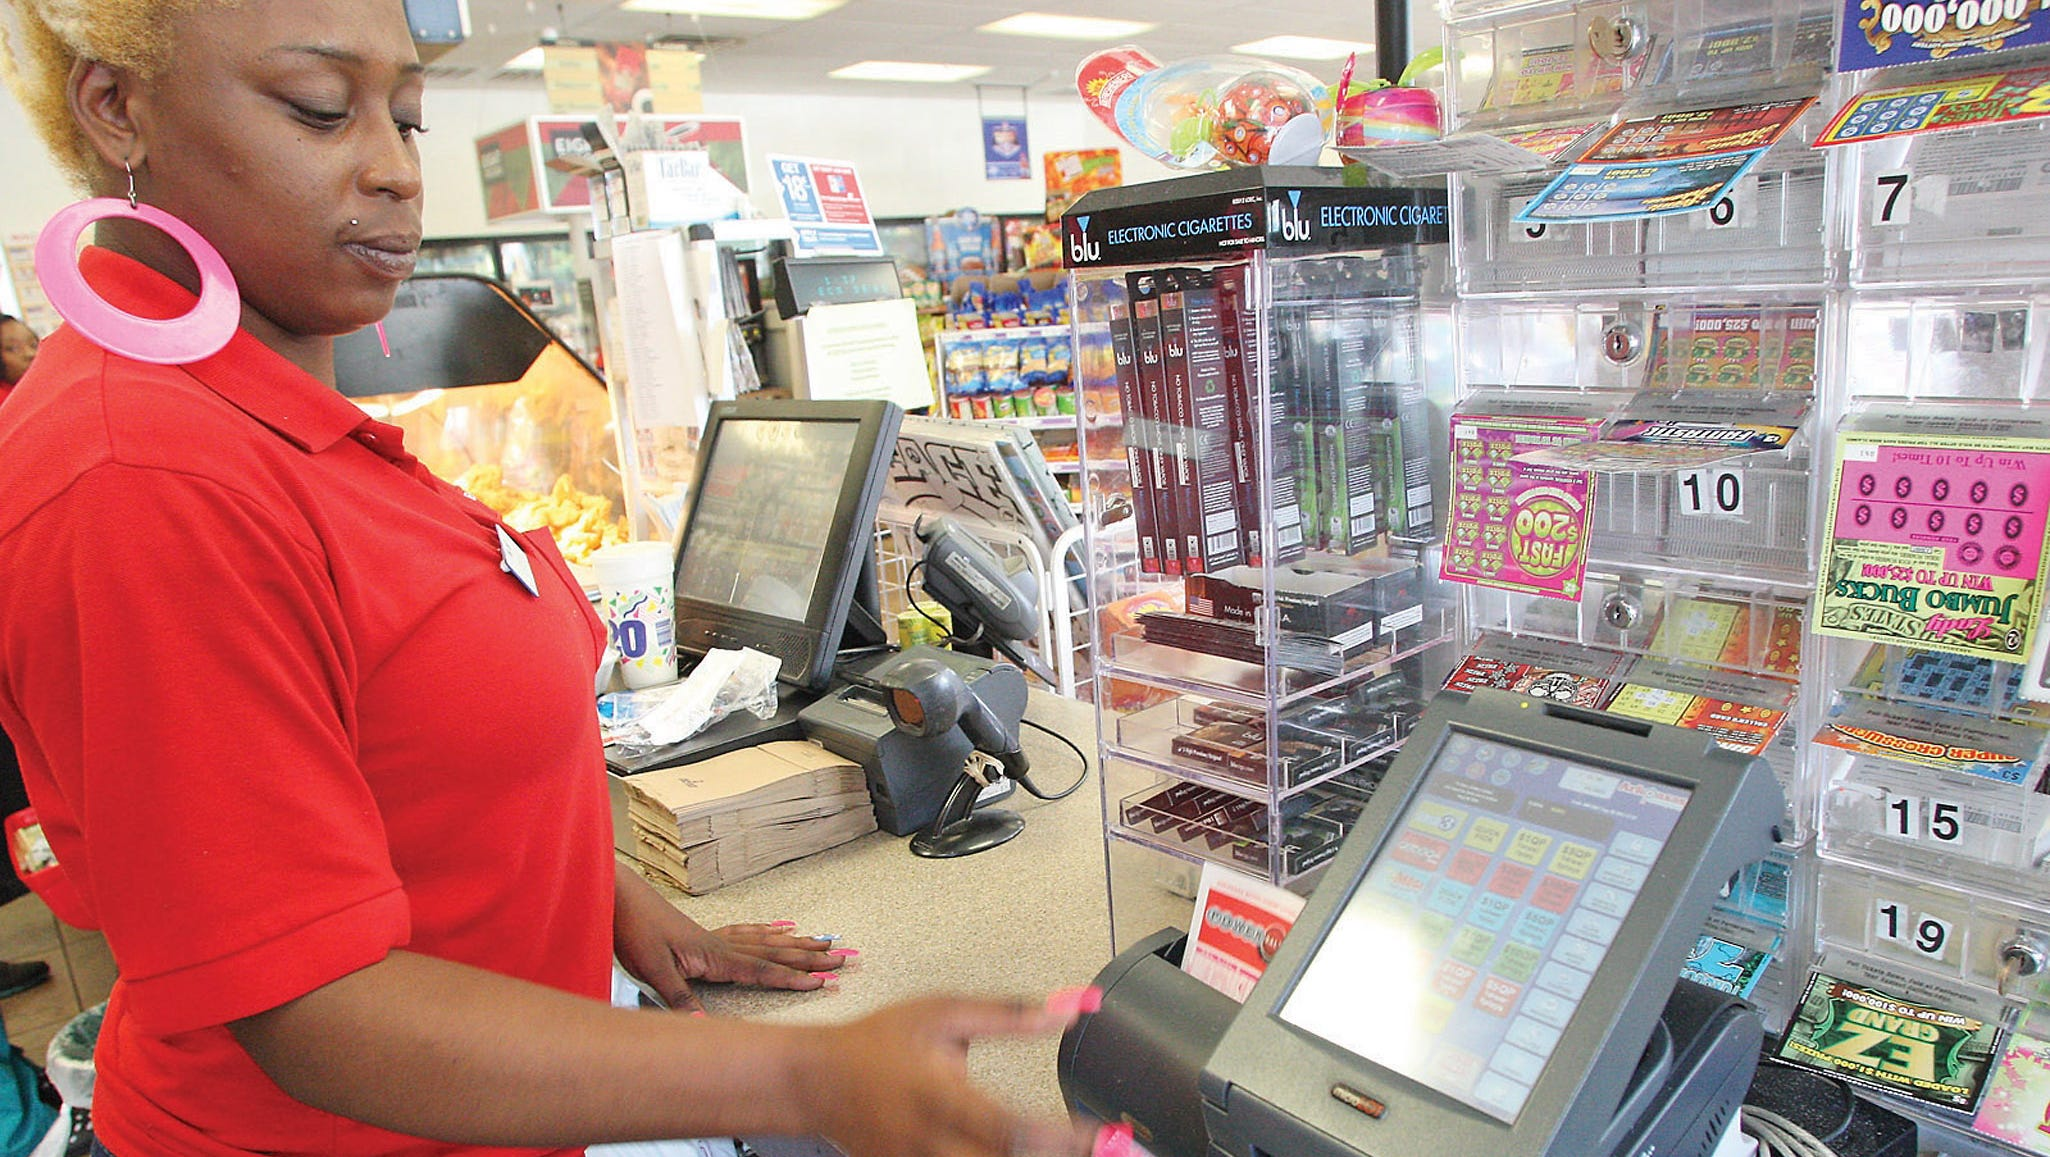 Meykai Howell runs a Powerball ticket through a machine at the Expressway #672 on East Main Street on Aug. 6 in El Dorado, Ark.